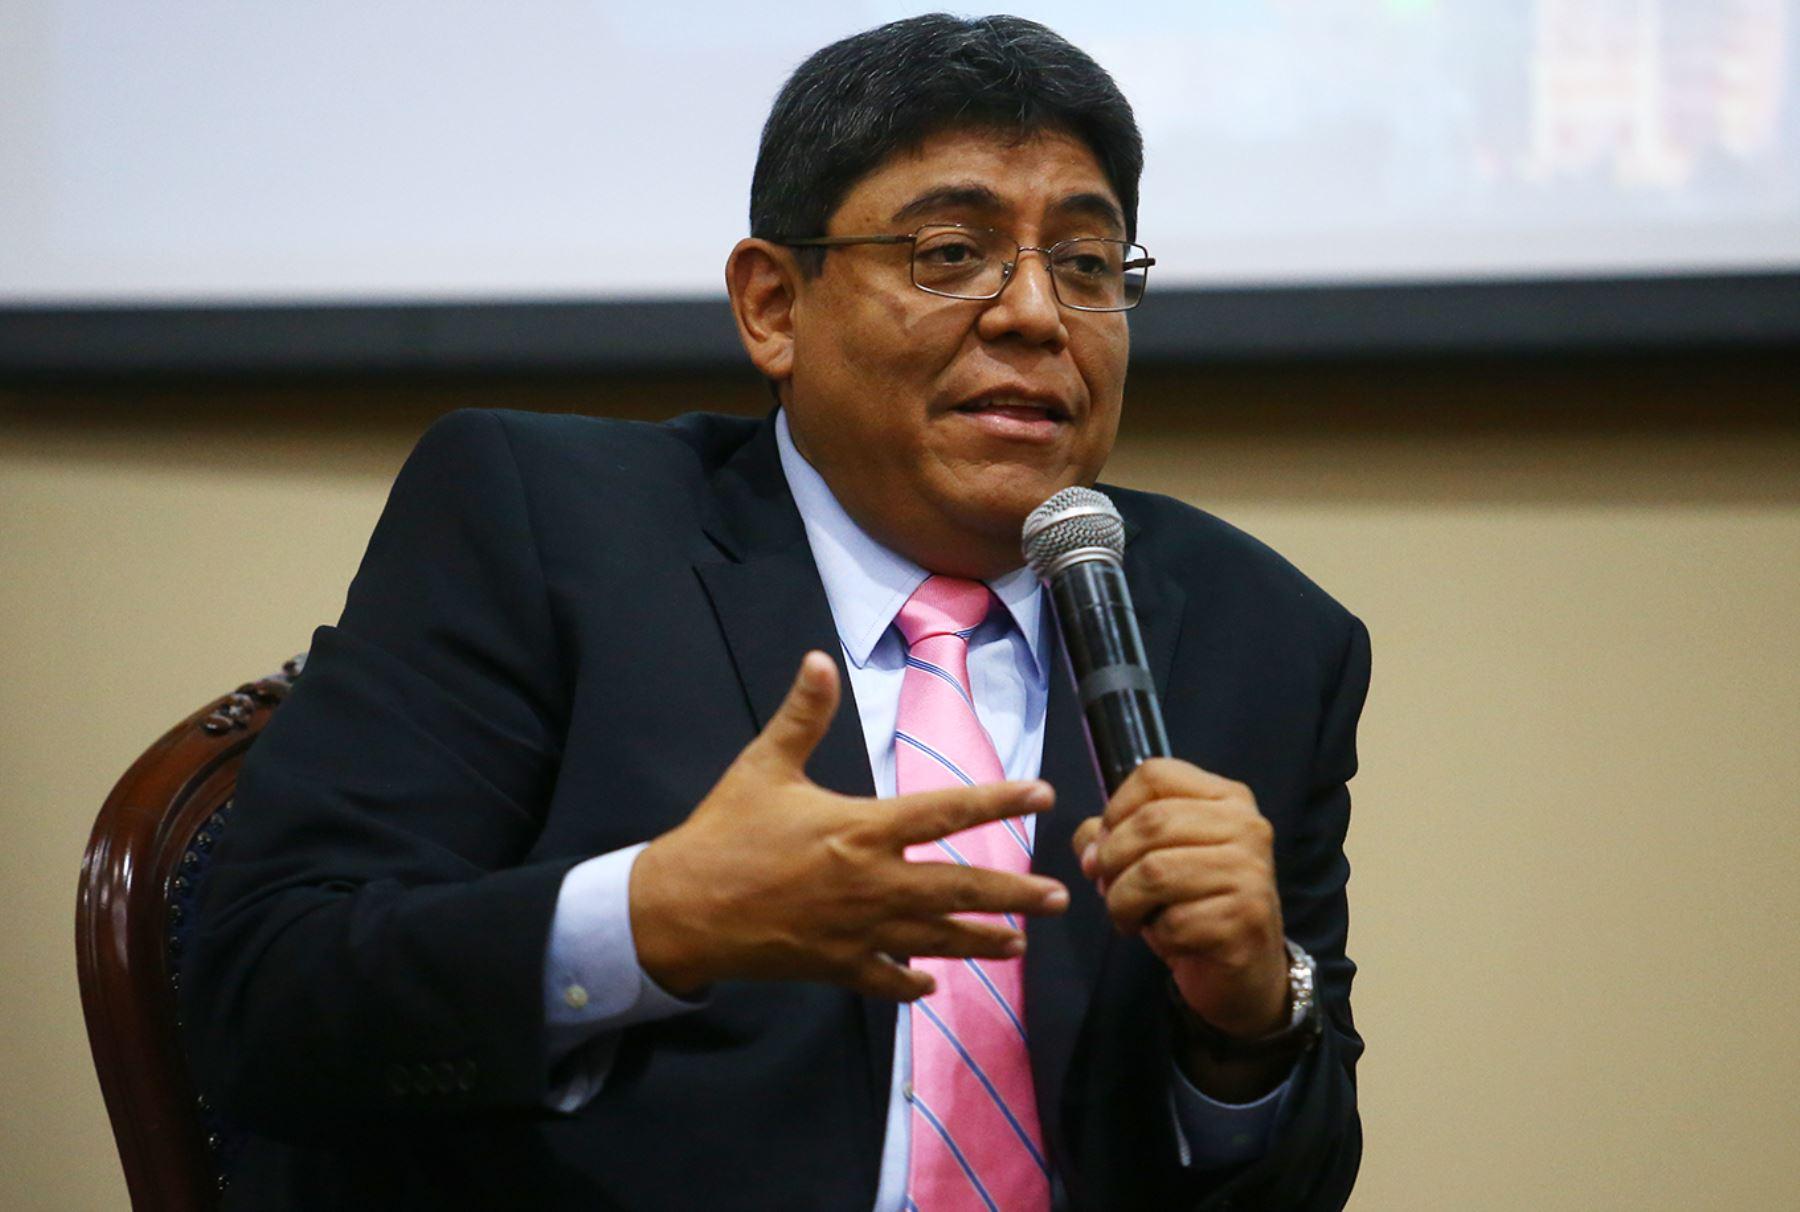 Director del Banco Central de Reserva, Elmer Cuba. ANDINA/Melina Mejía